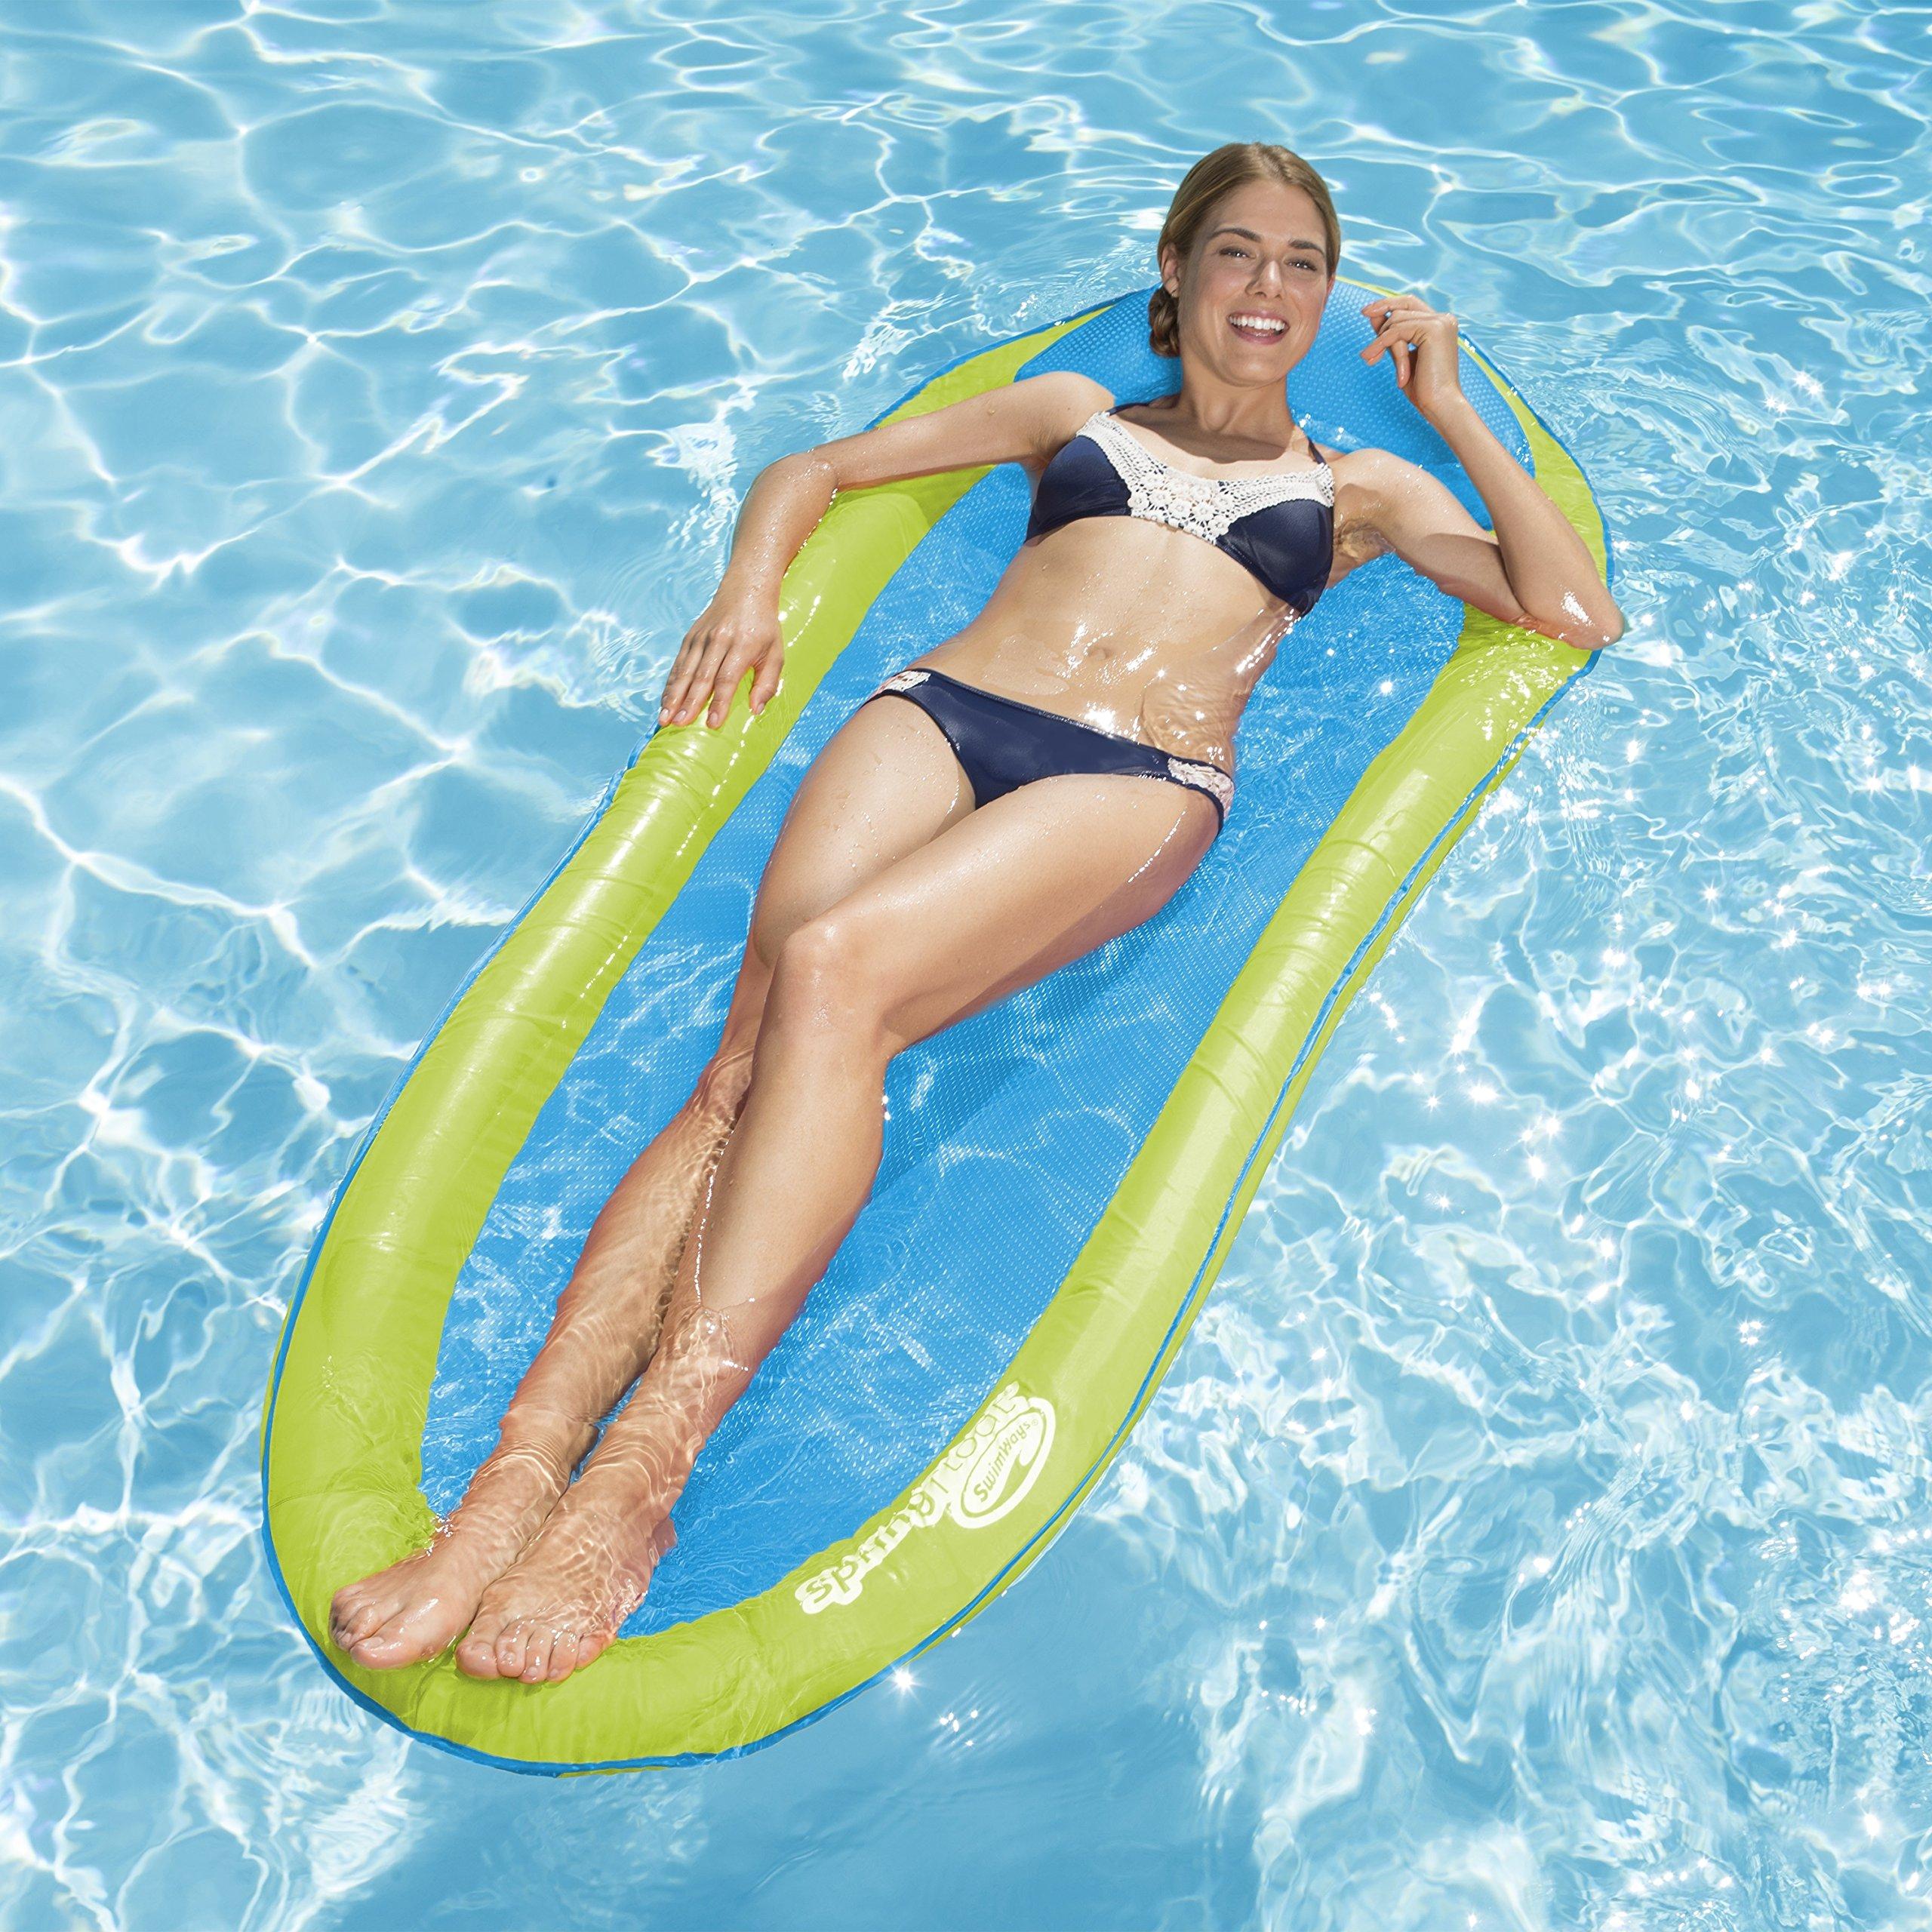 SwimWays Original Spring Float - Floating Swim Hammock for Pool or Lake - Lime/Light Blue by SwimWays (Image #3)